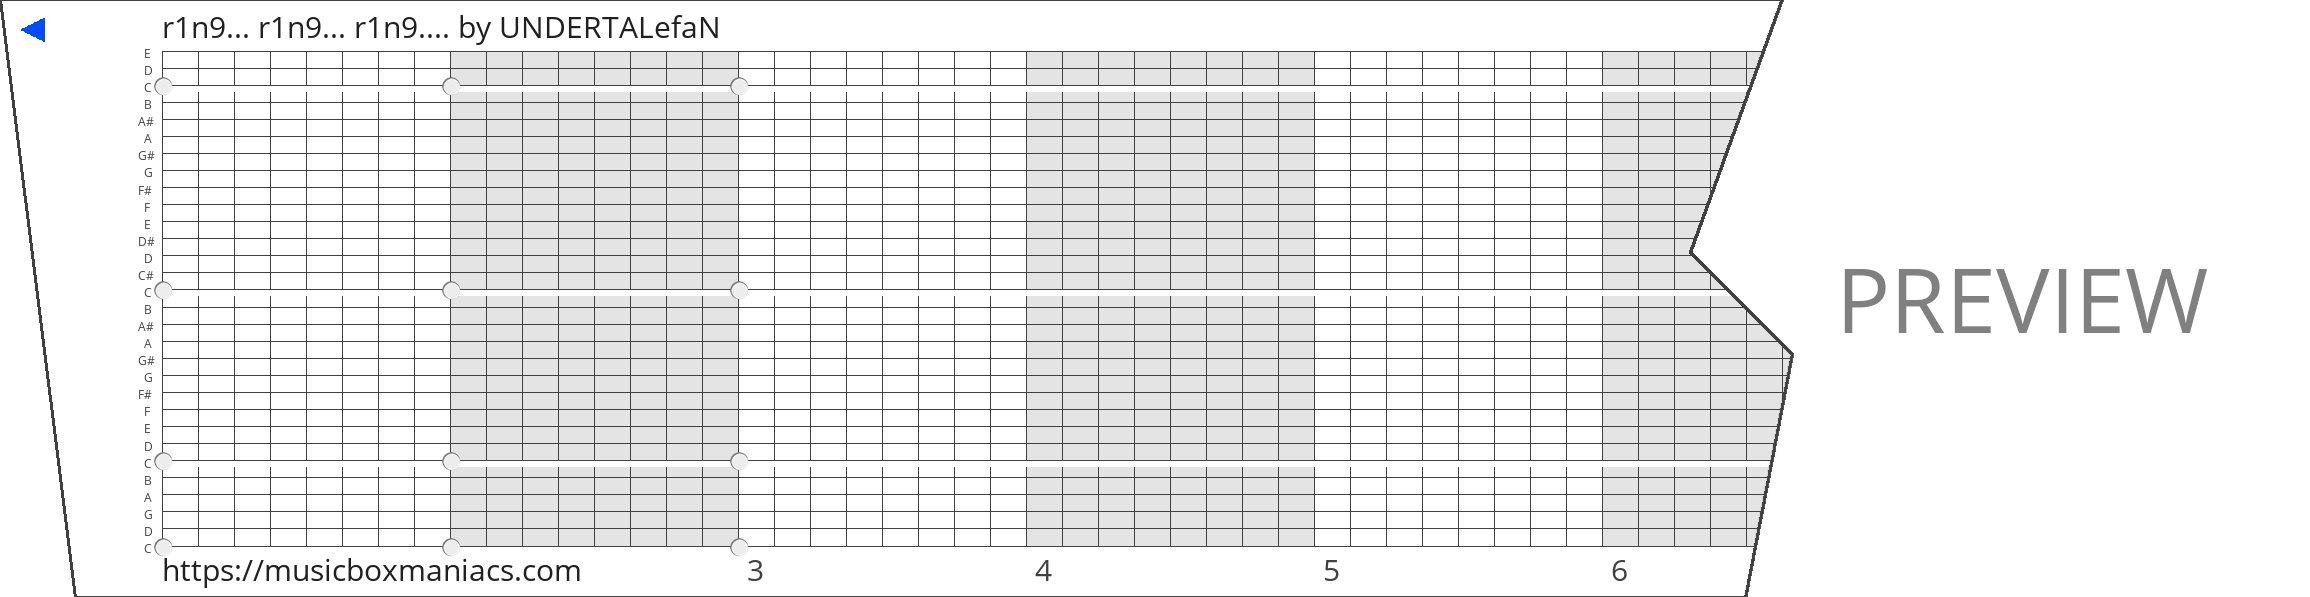 r1n9... r1n9... r1n9.... 30 note music box paper strip